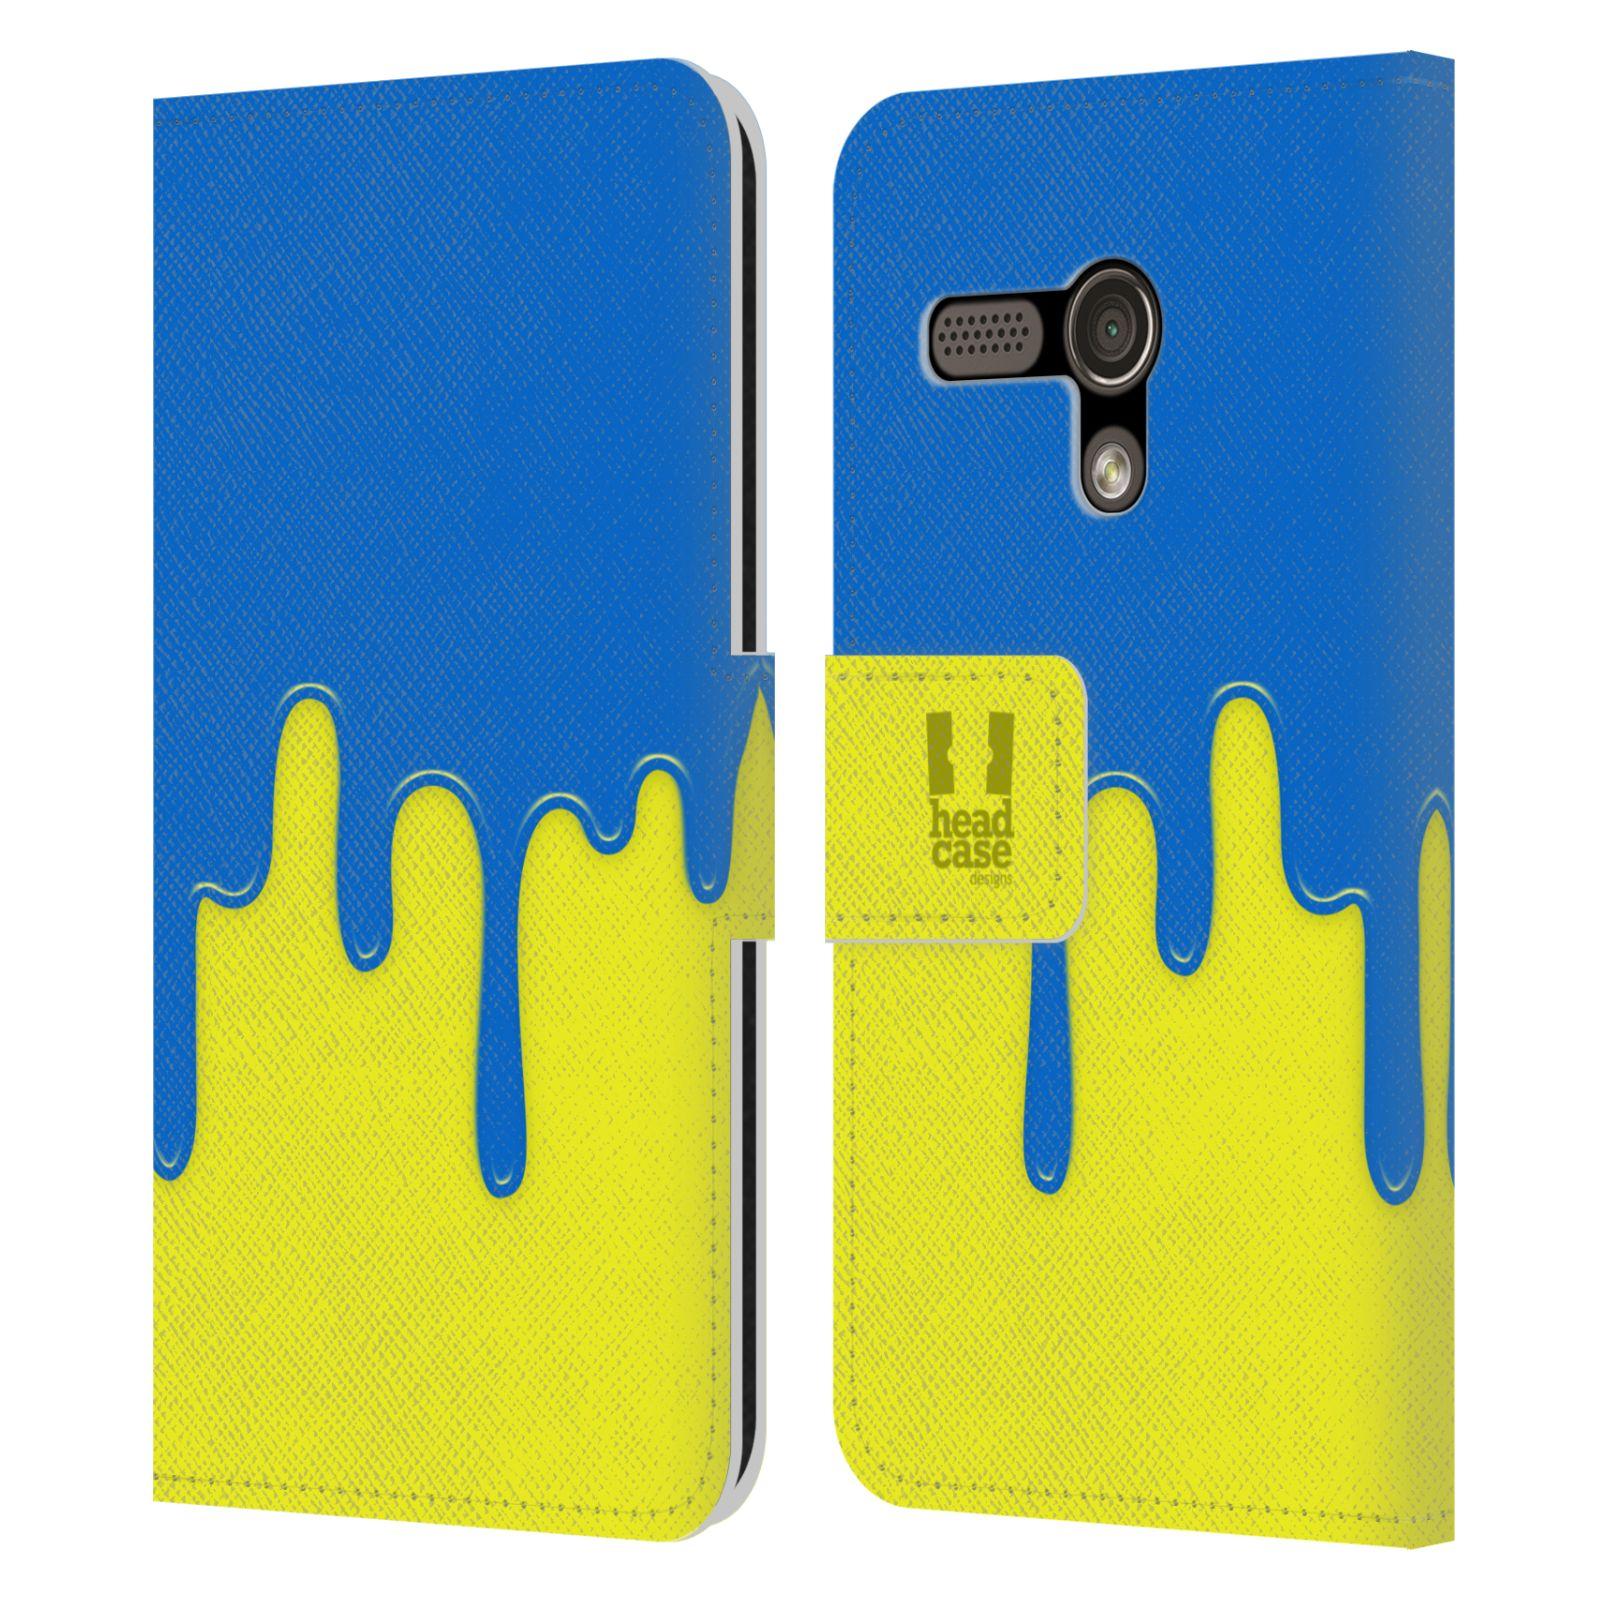 HEAD CASE Flipové pouzdro pro mobil MOTOROLA MOTO G Rozlitá barva modrá a žlutá